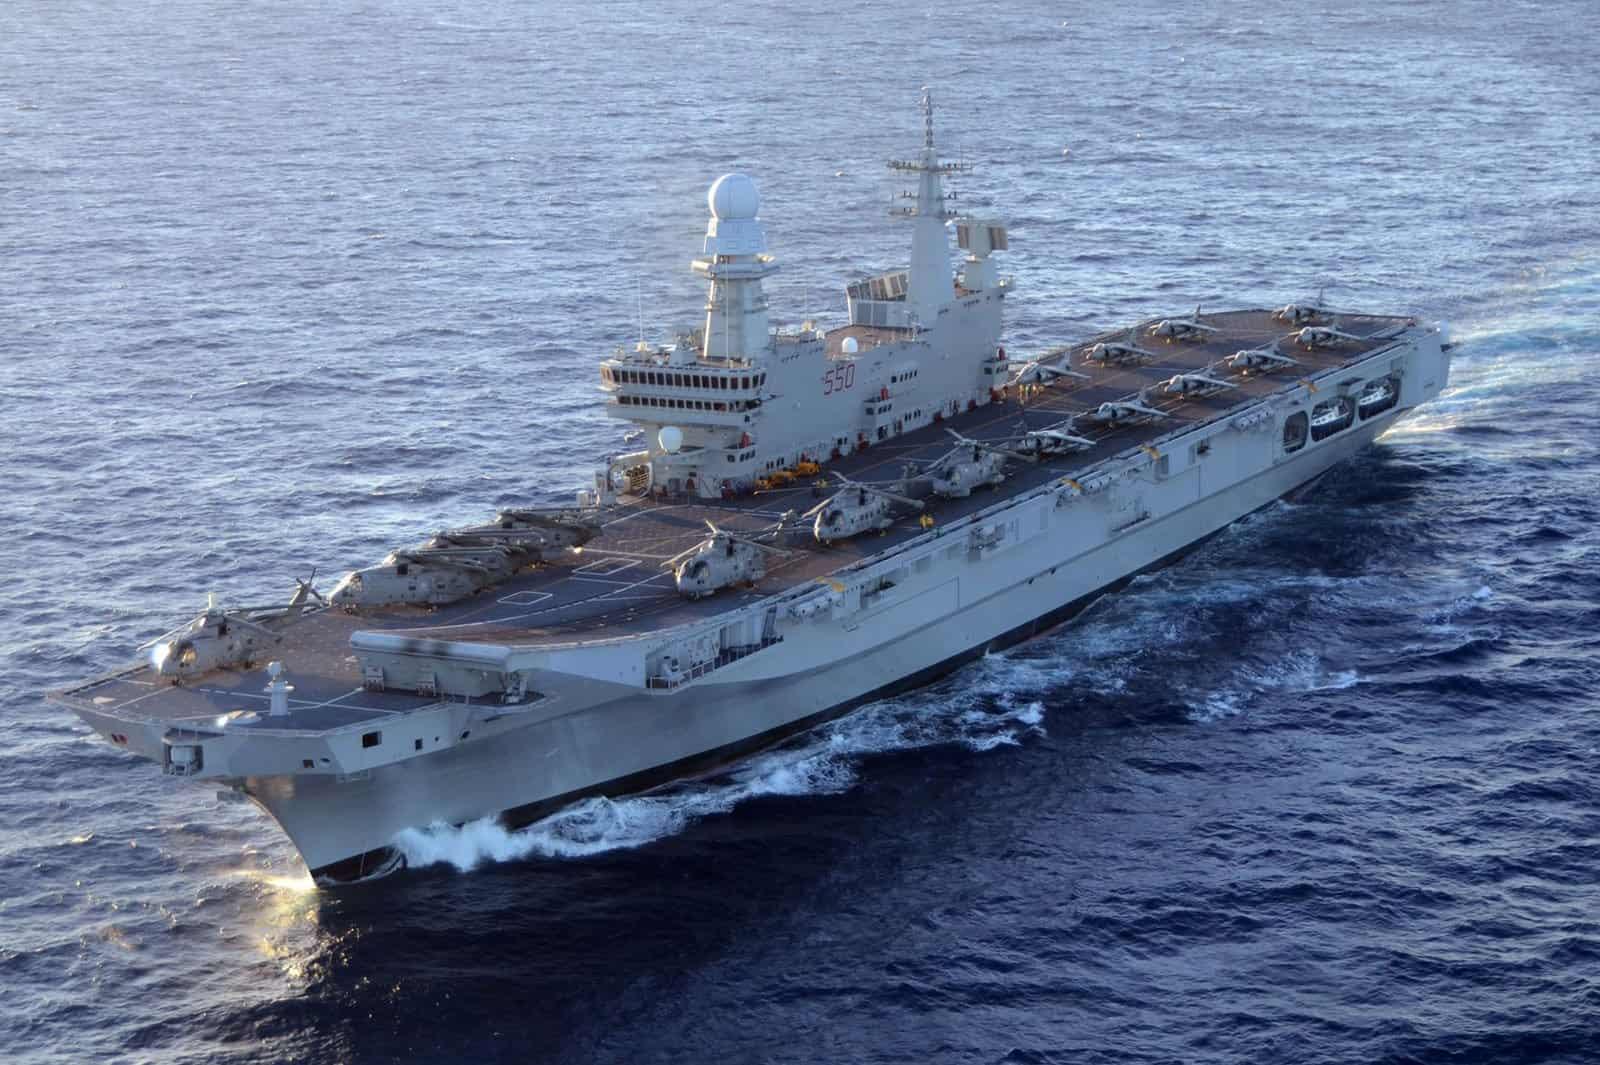 Авіаносець Cavour (C 550) ВМС Італії